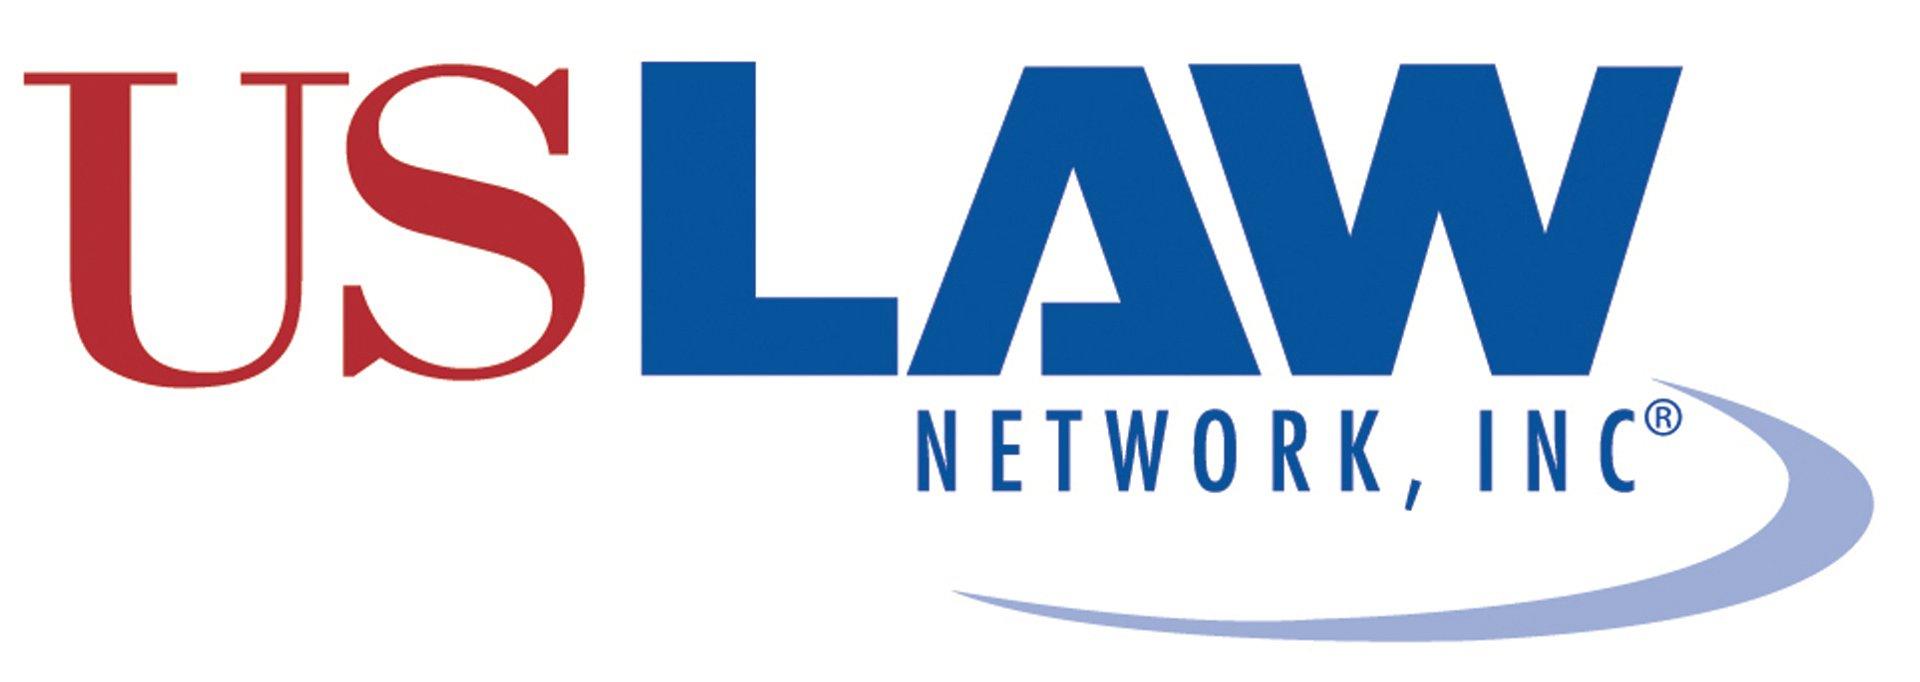 USLAW NETWORK LOGO